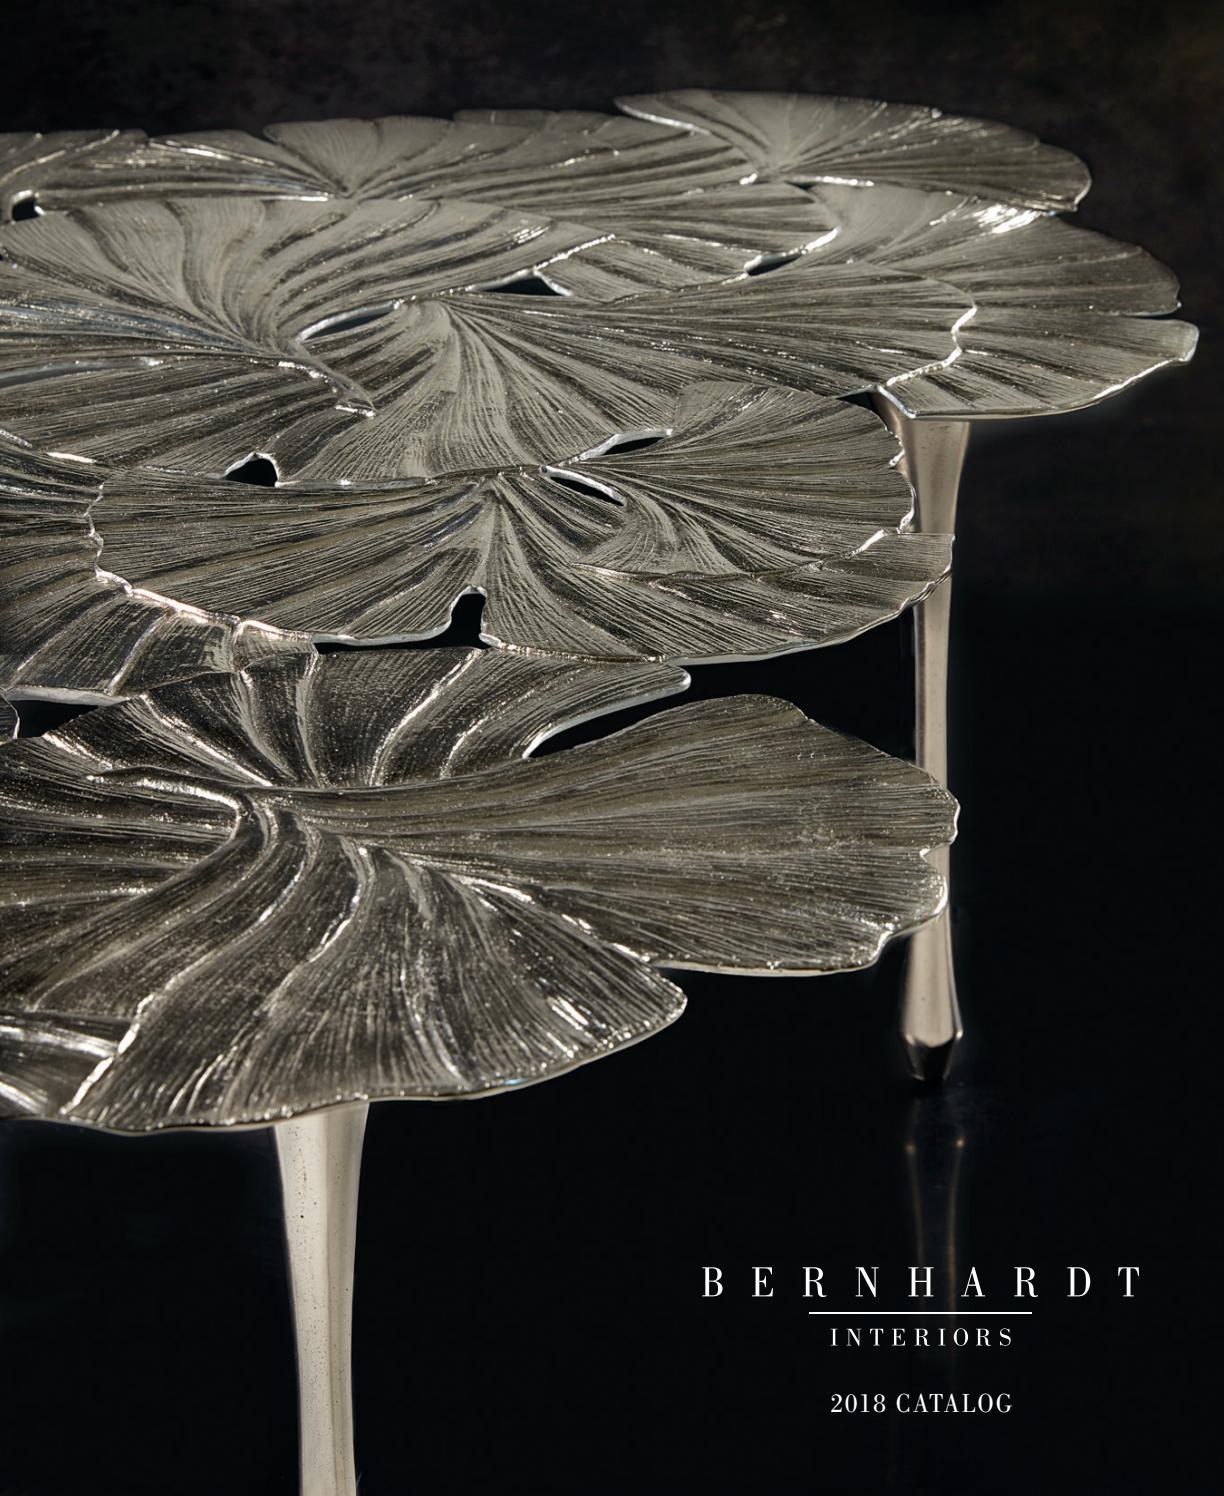 Interiors 2018 Catalogbernhardt - Issuu in Candide Wood Credenzas (Image 18 of 30)